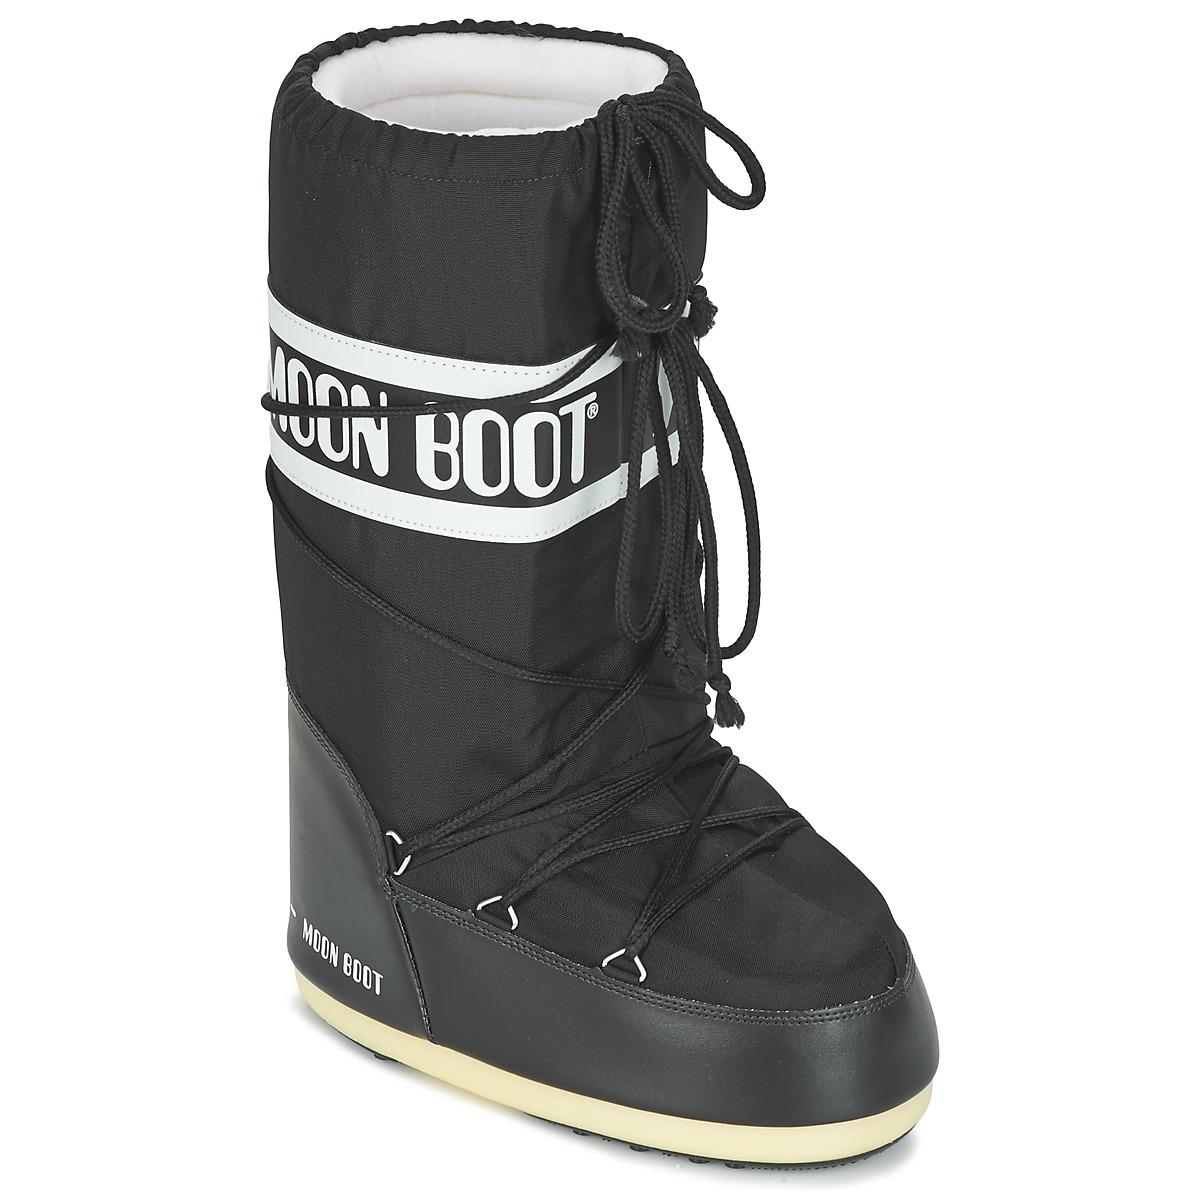 Vinterstøvler Moon Boot  MOON BOOT NYLON